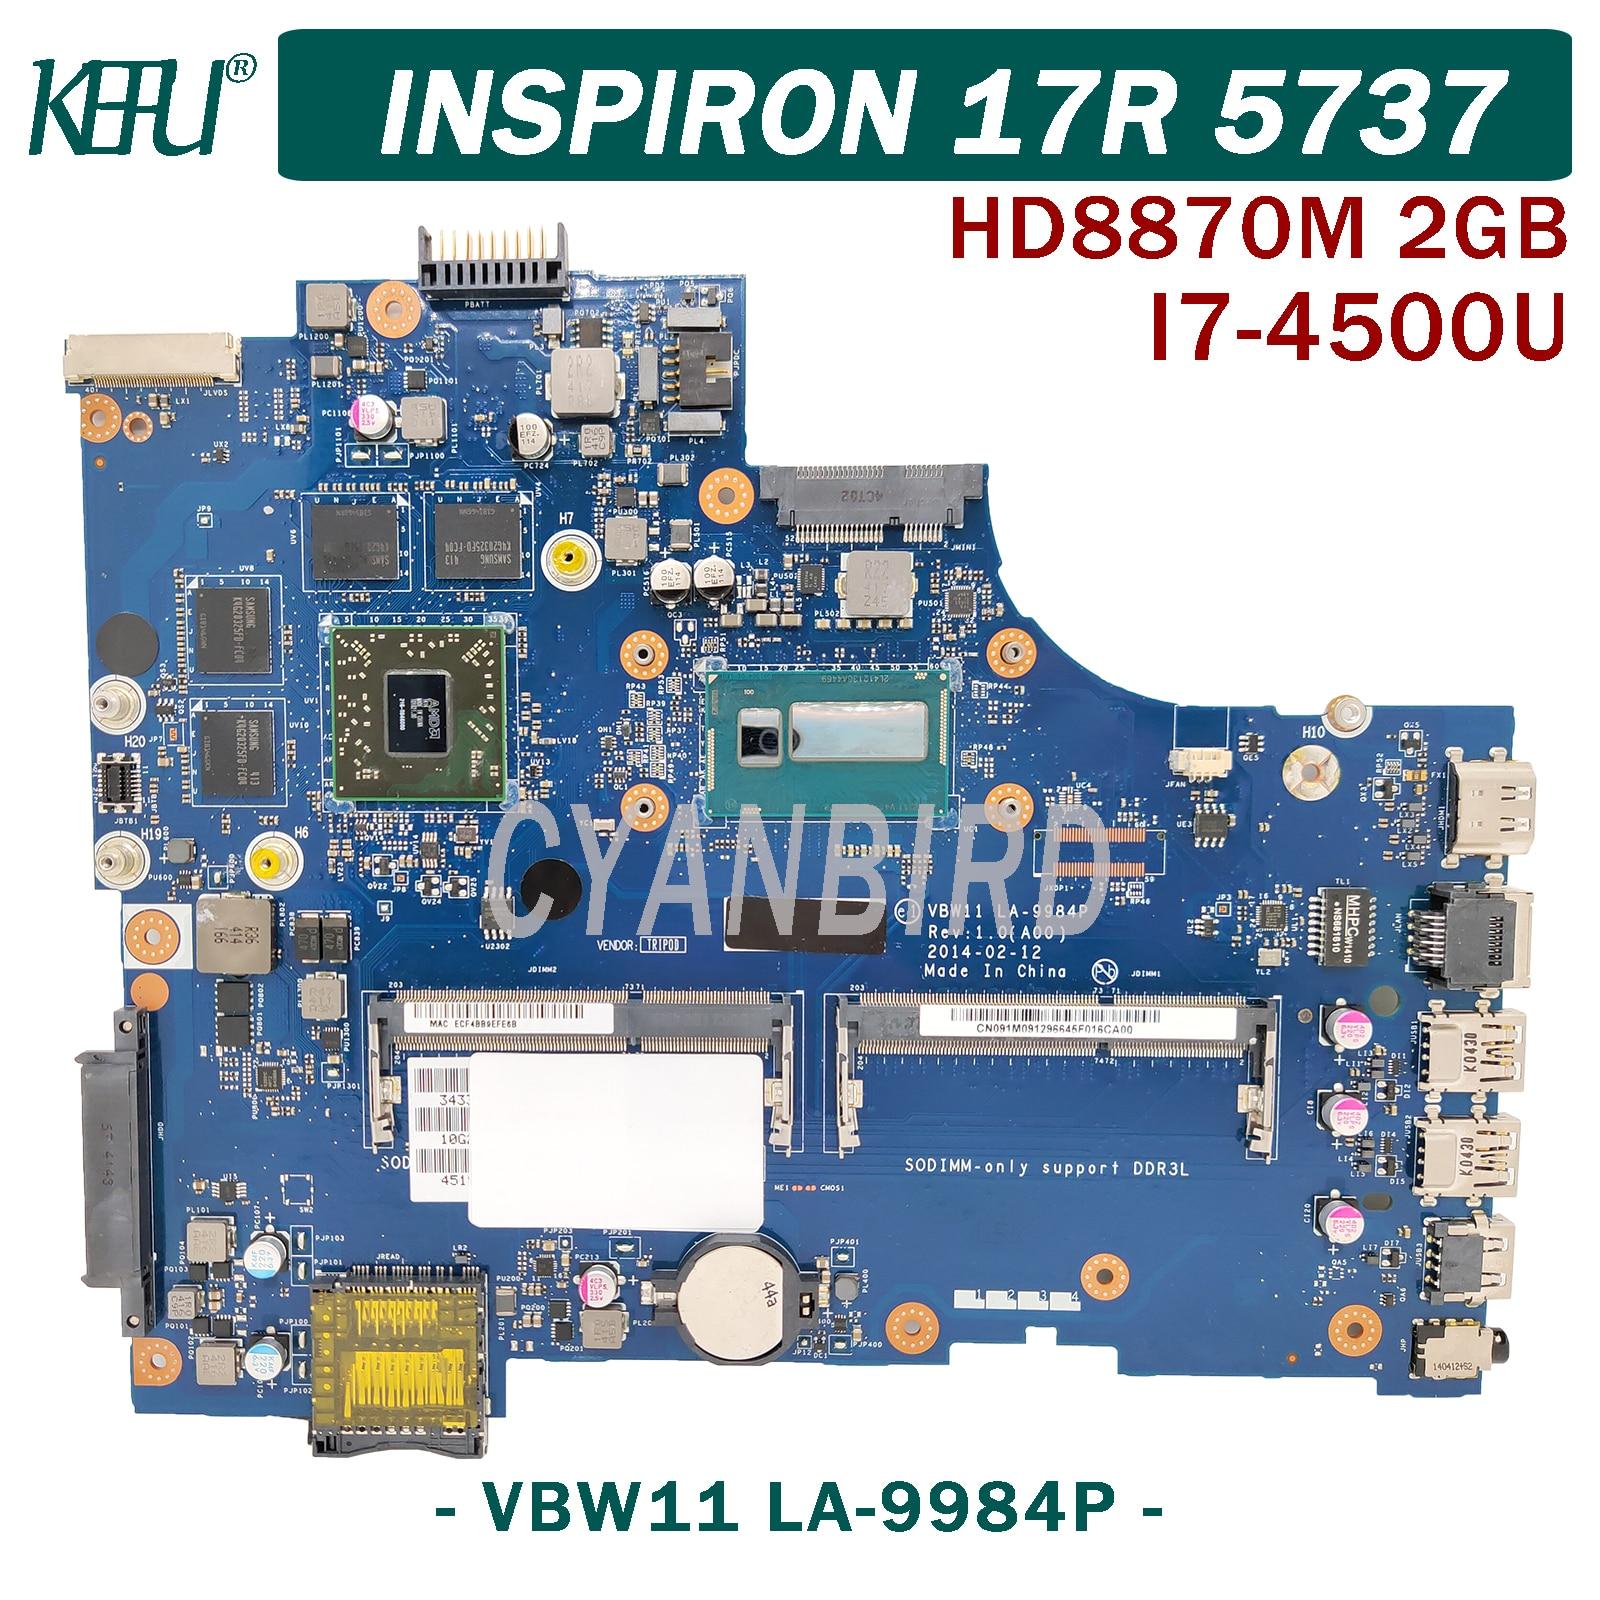 KEFU VBW11 LA-9984P اللوحة الرئيسية الأصلية لديل 17R-5737 3737 مع I7-4500U HD8870M/R9-M270X 2GB اللوحة الأم للكمبيوتر المحمول